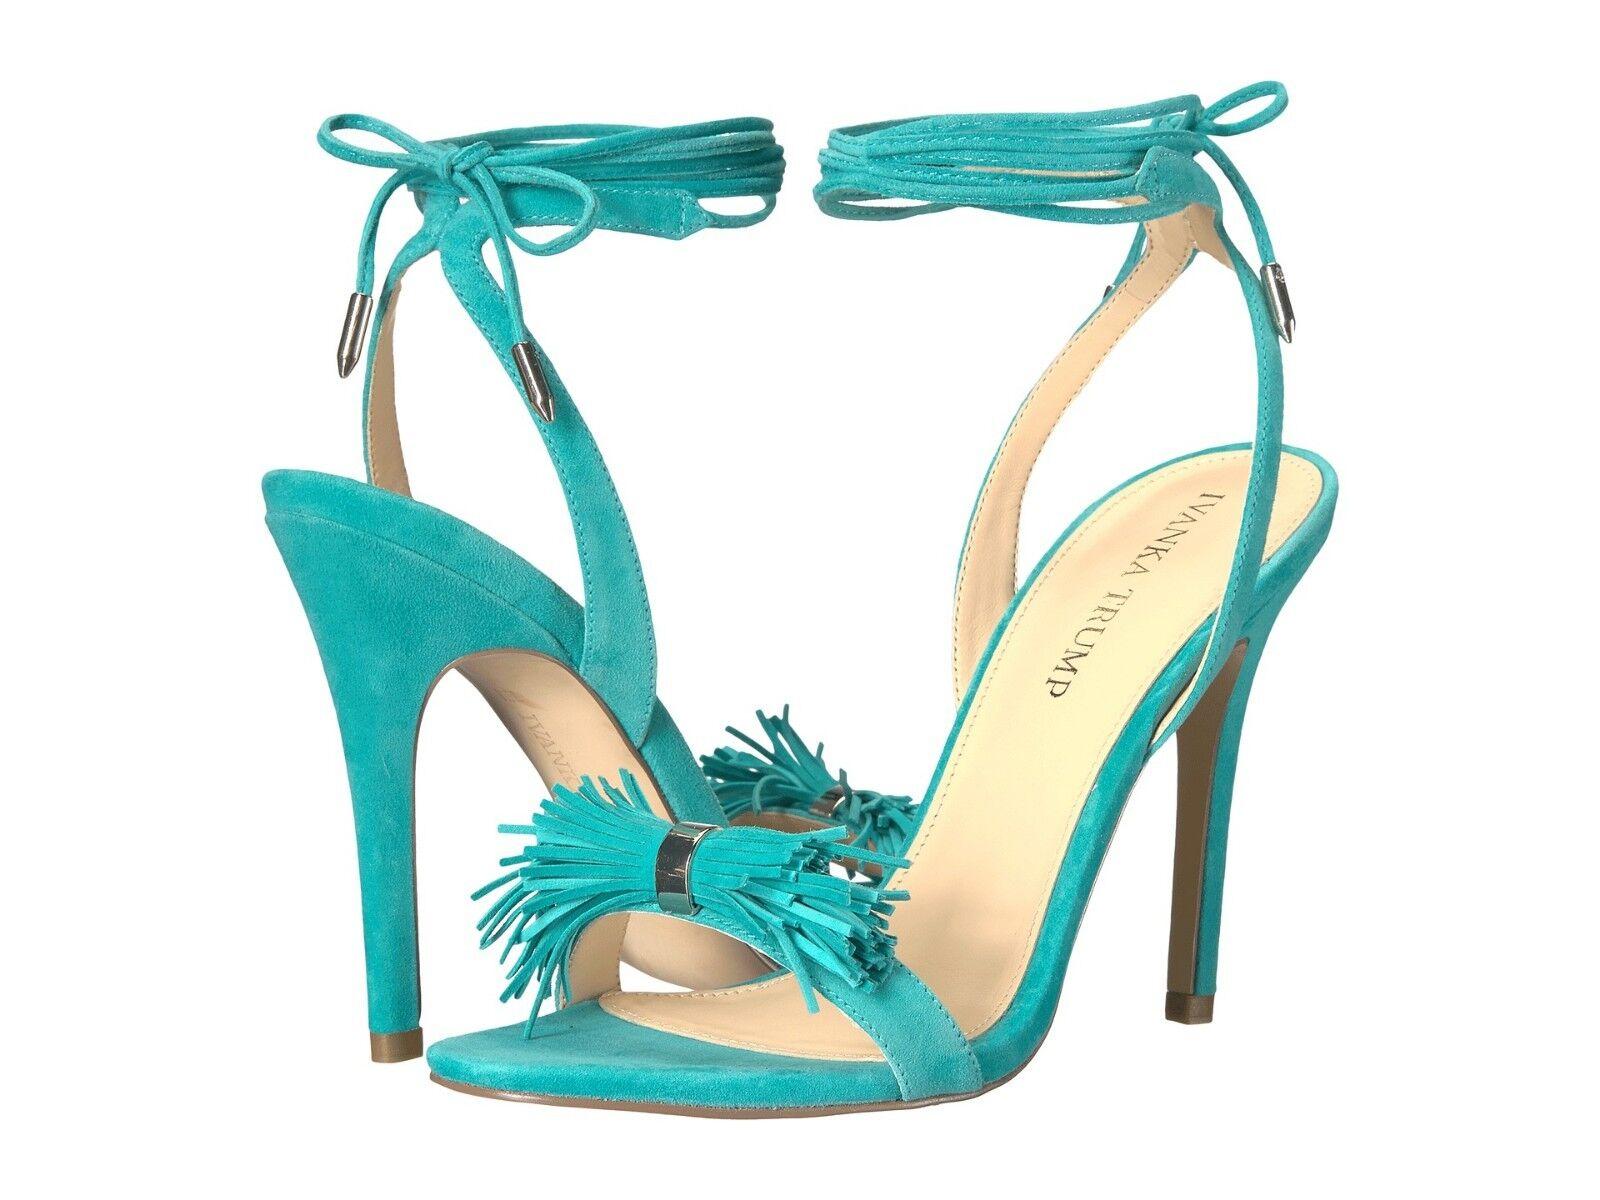 Ivanka Trump HETHAL Womens Suede Leather Dress SandalSz 9 Turquoise NIB . 130